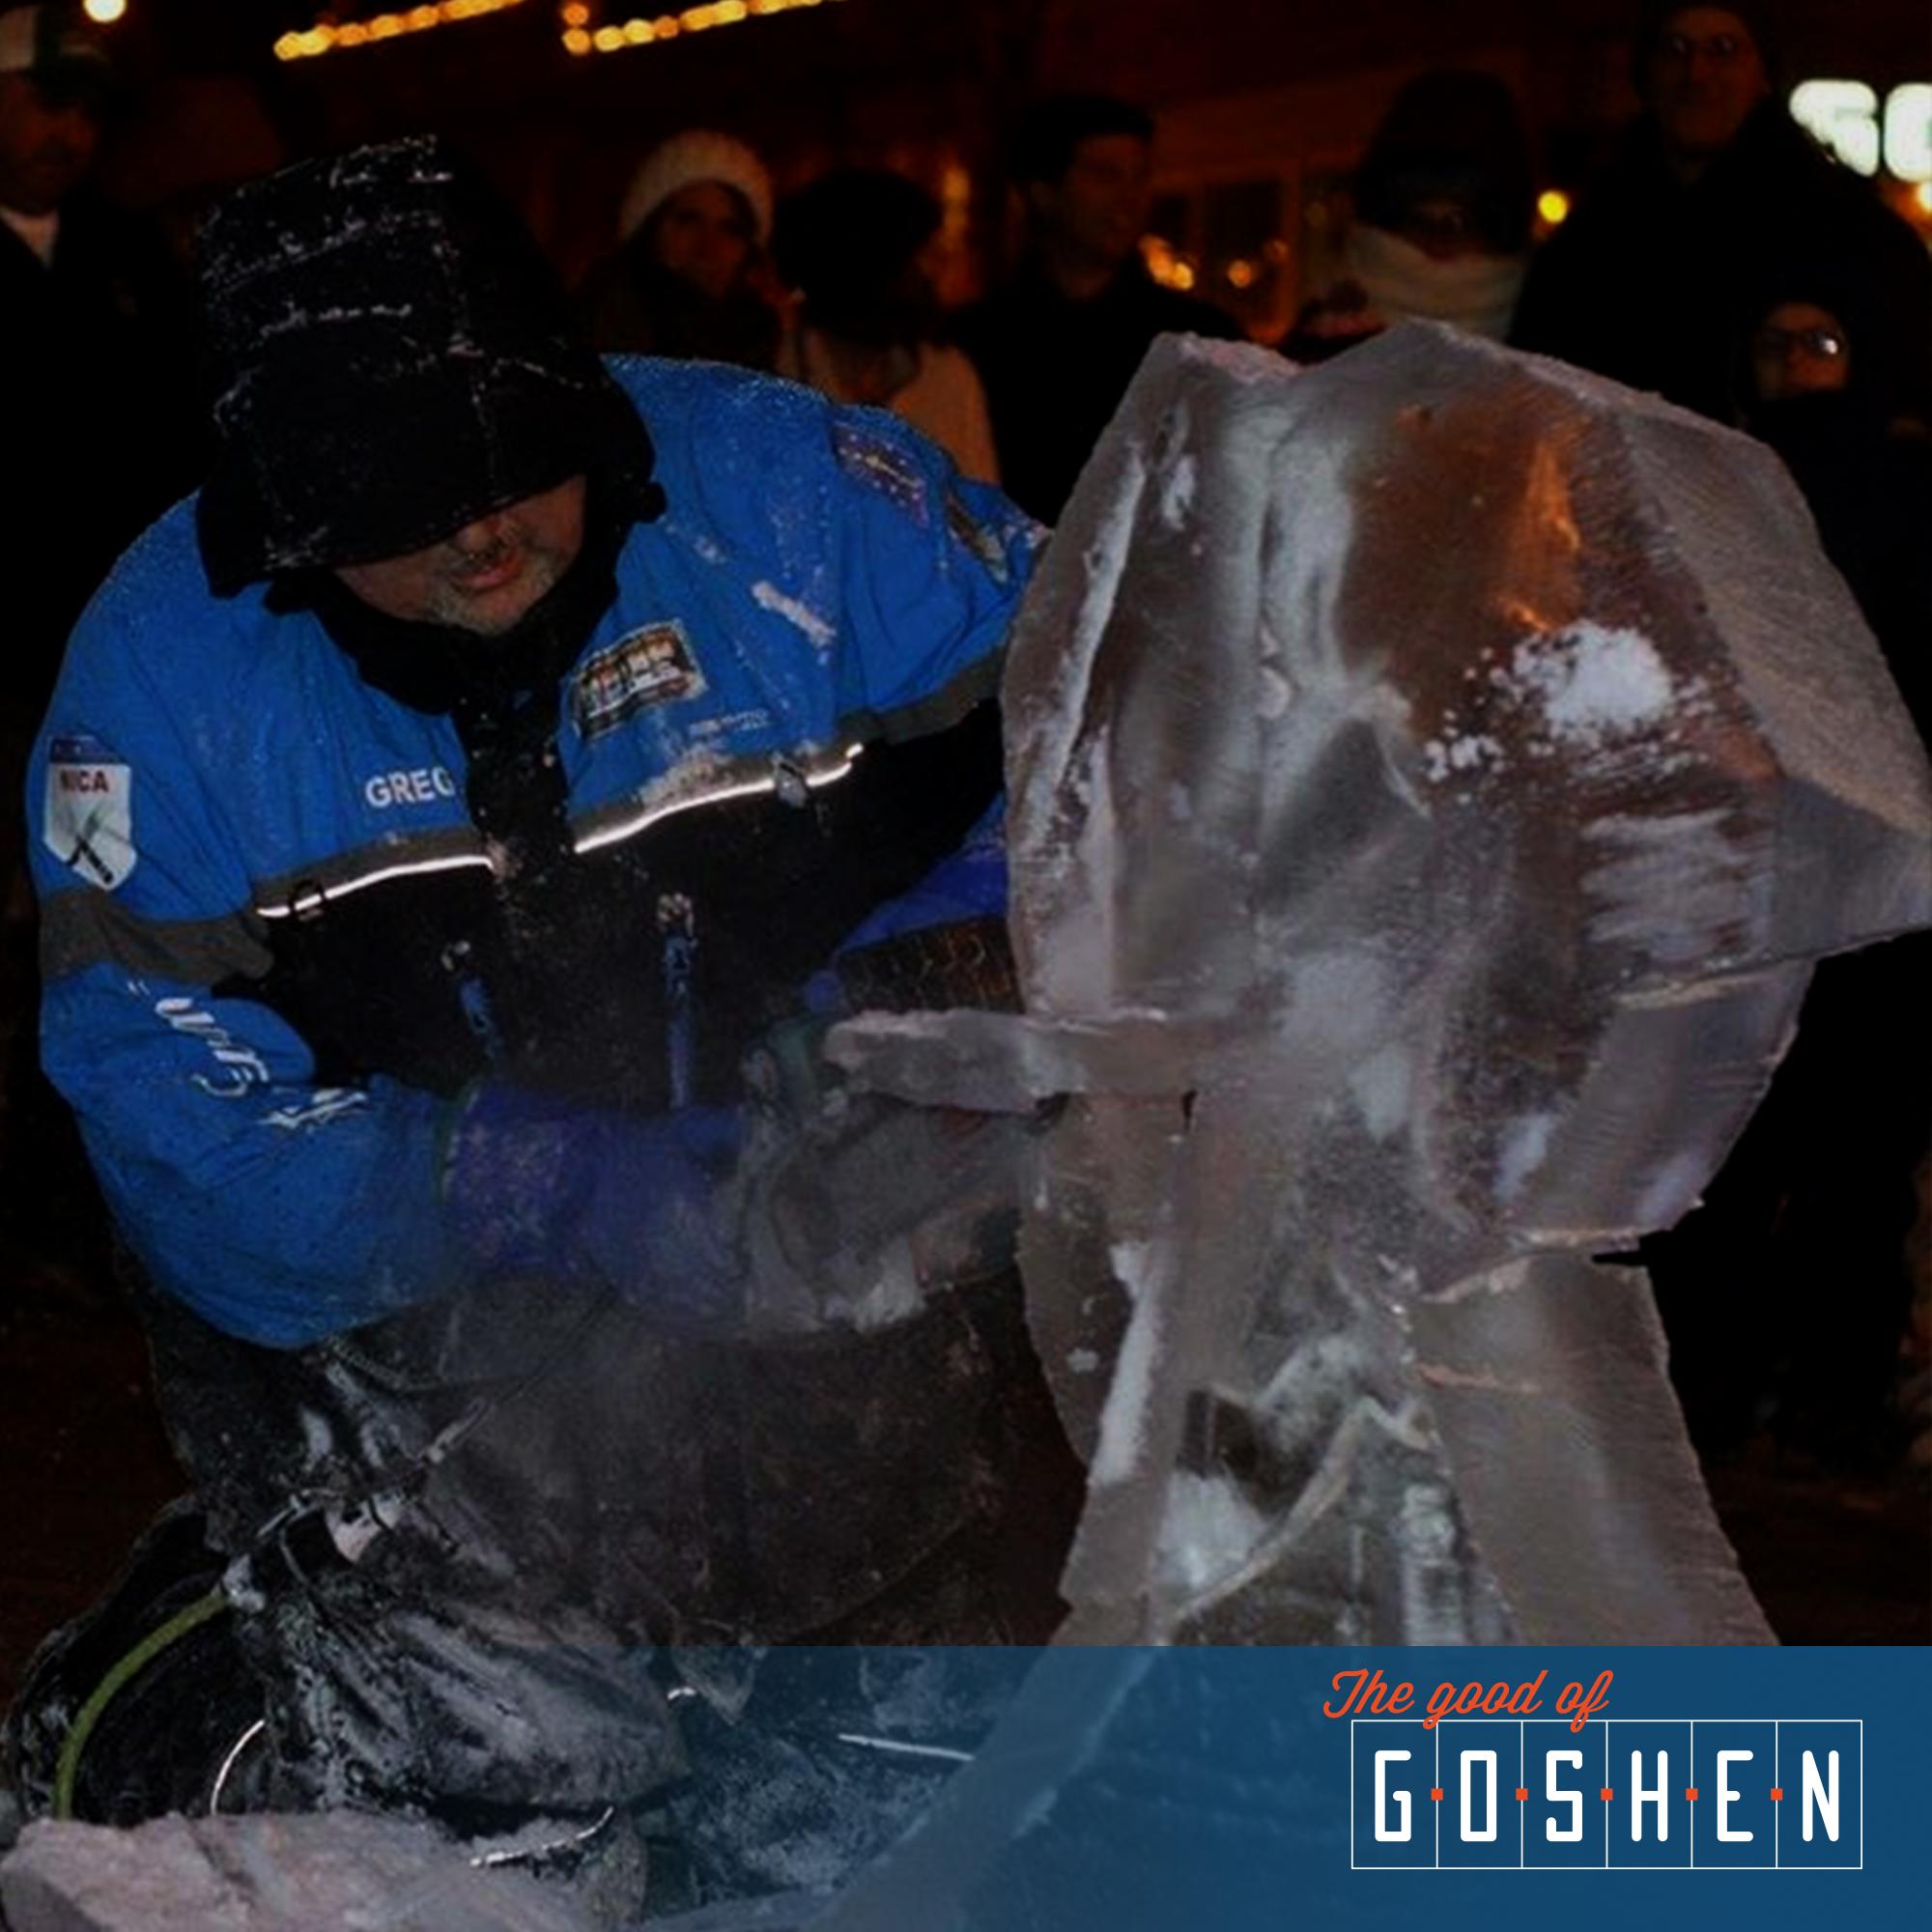 Greg Beachey • The Good of Goshen